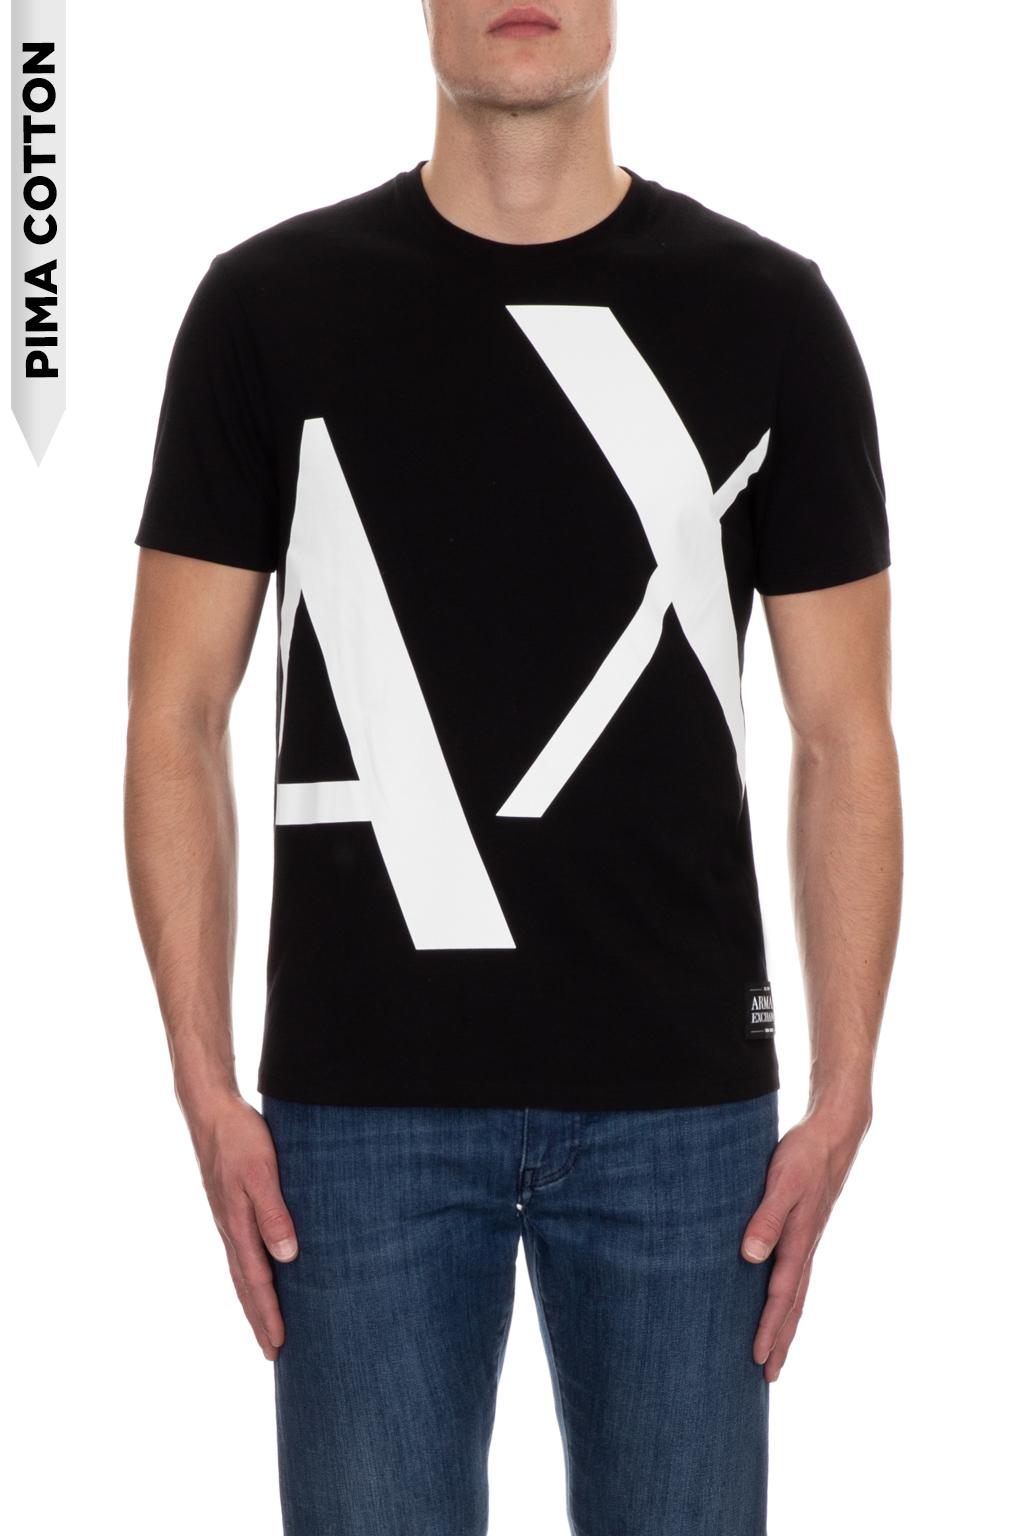 T-shirt uomo stampata manica corta ARMANI EXCHANGE